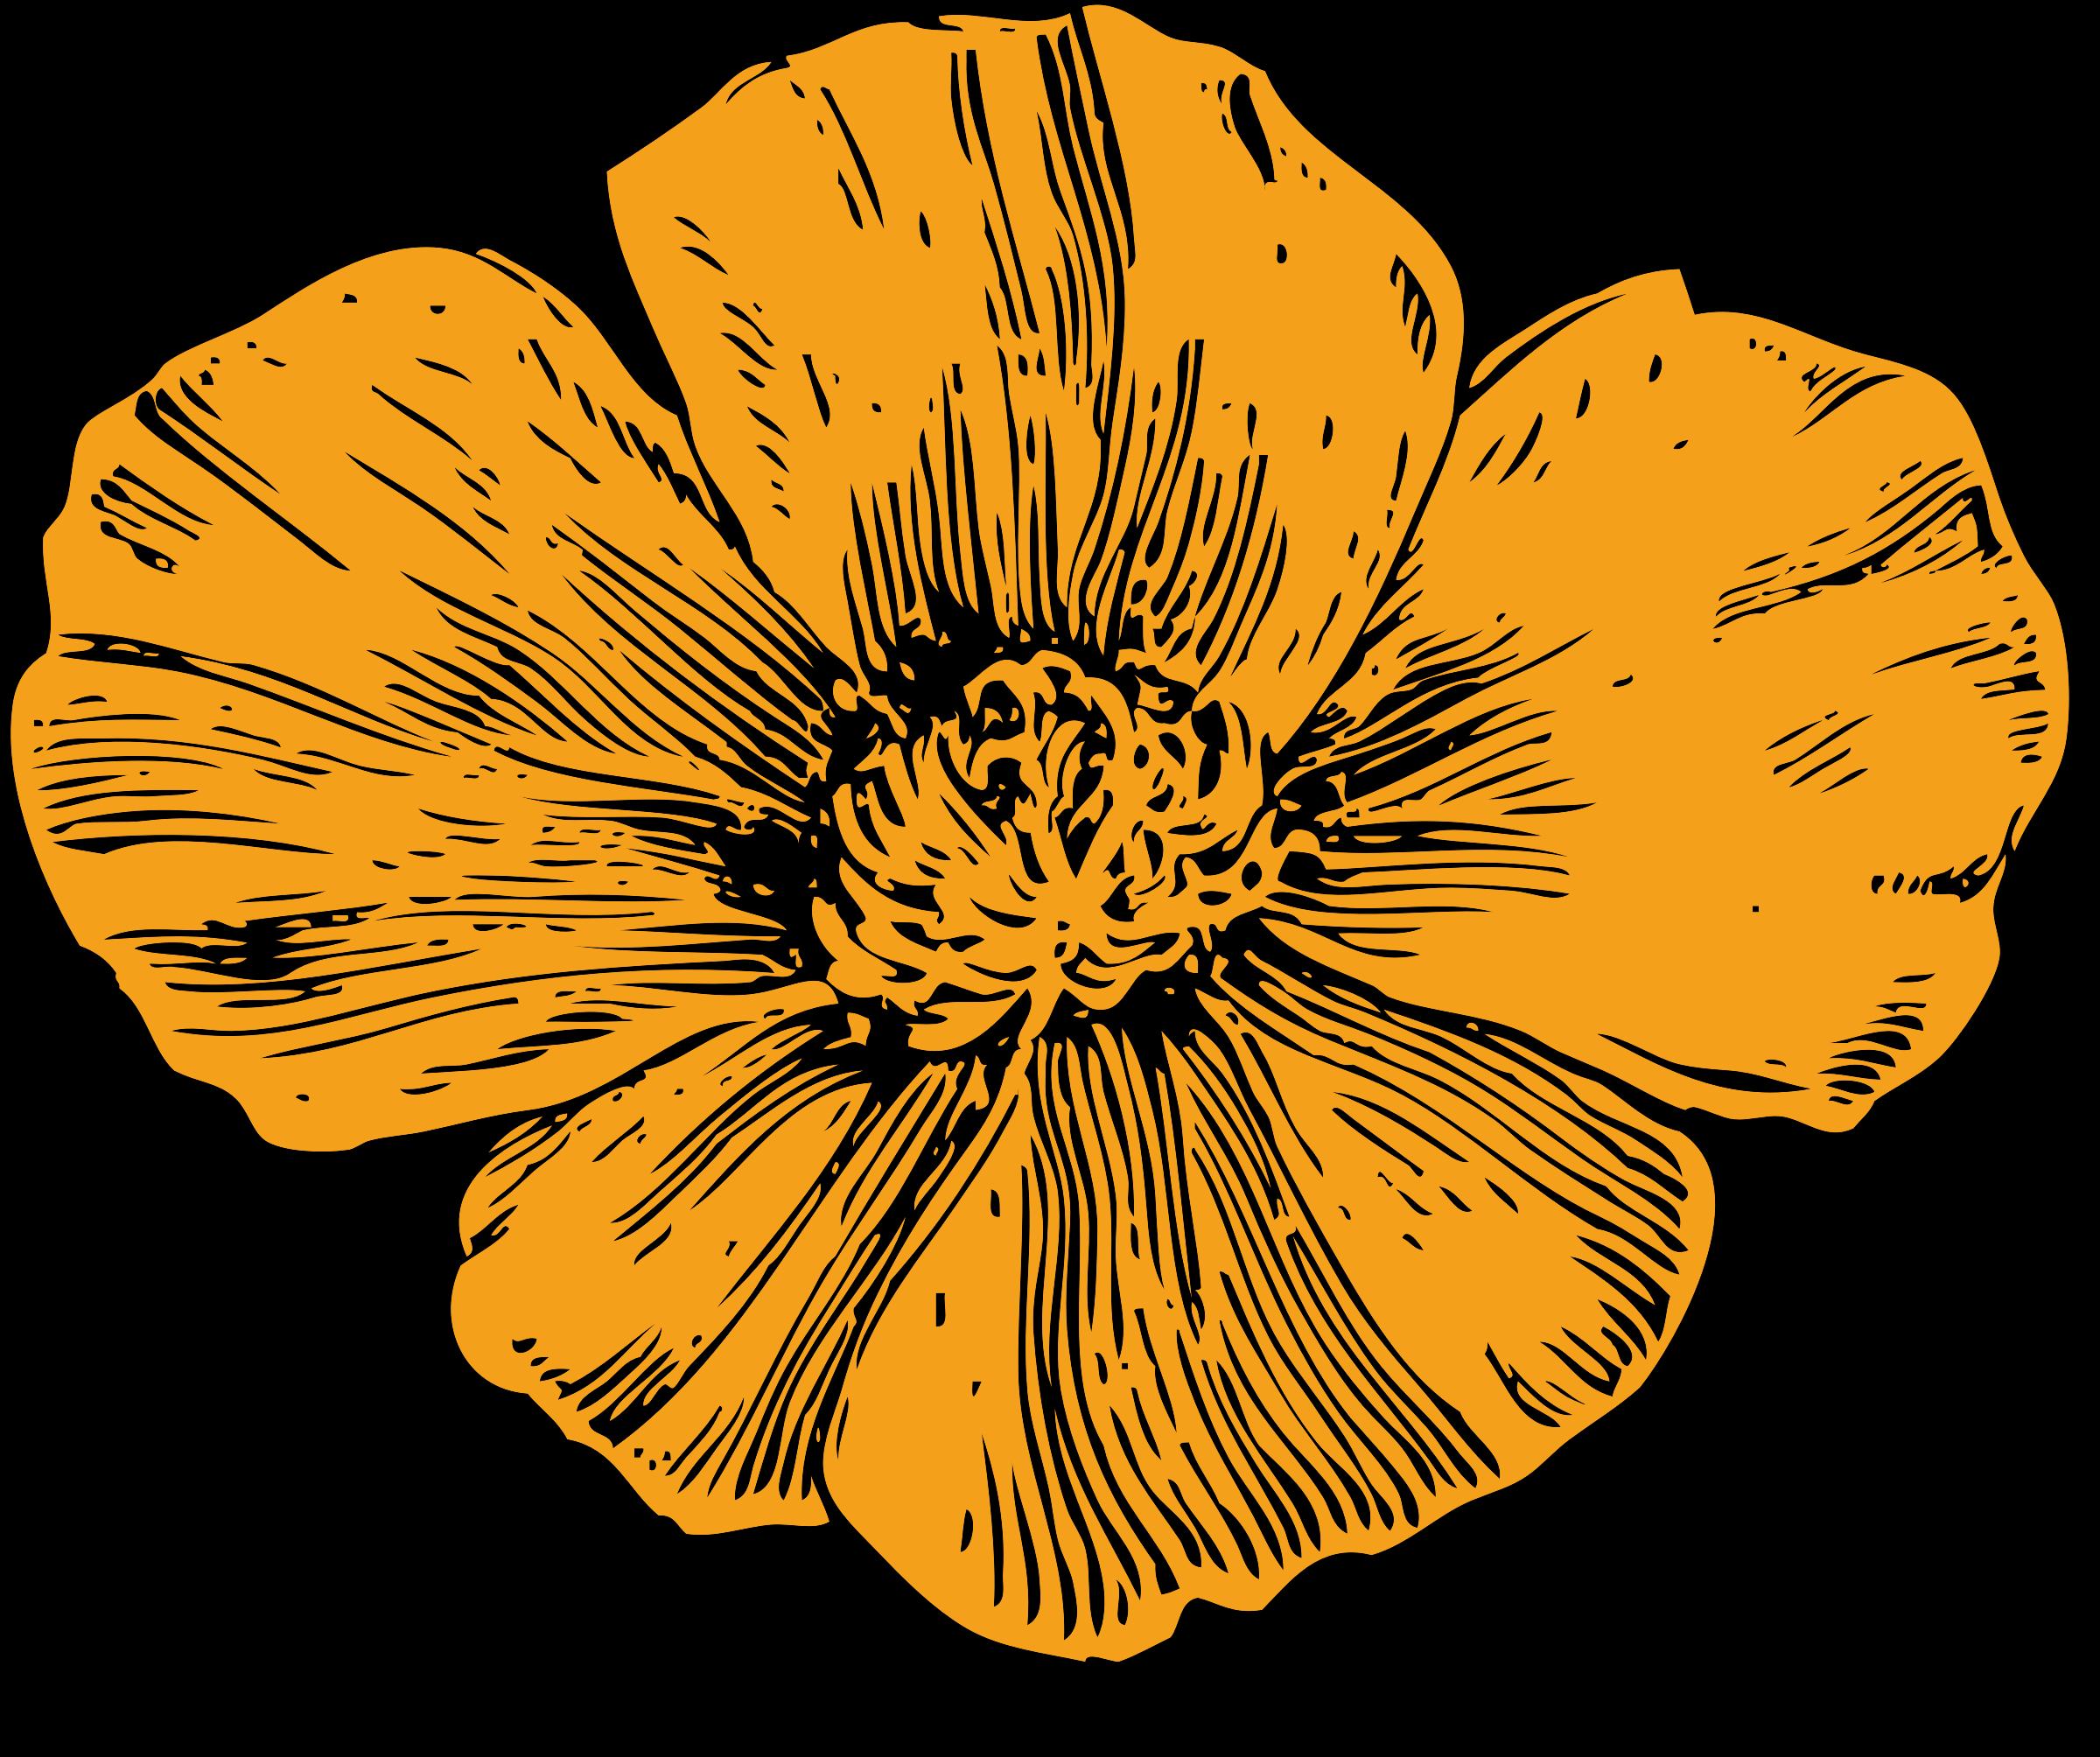 California icons png free. Poppy clipart orange tulip